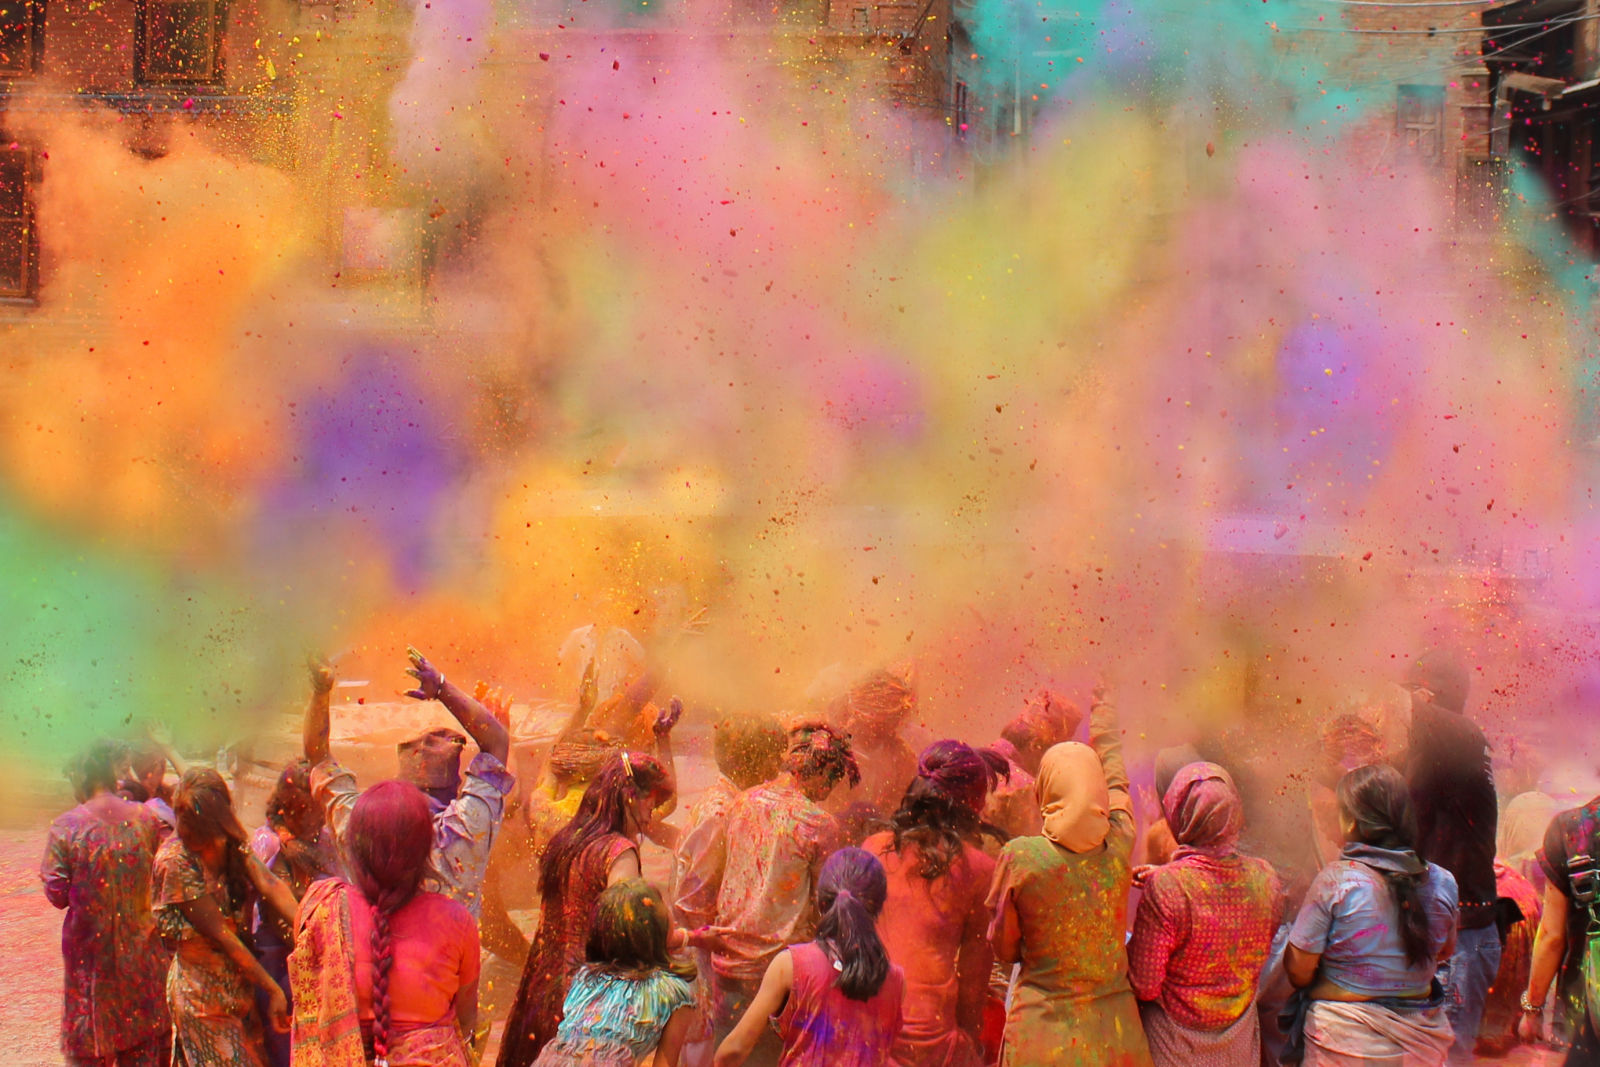 Asia, Crowd, Festival